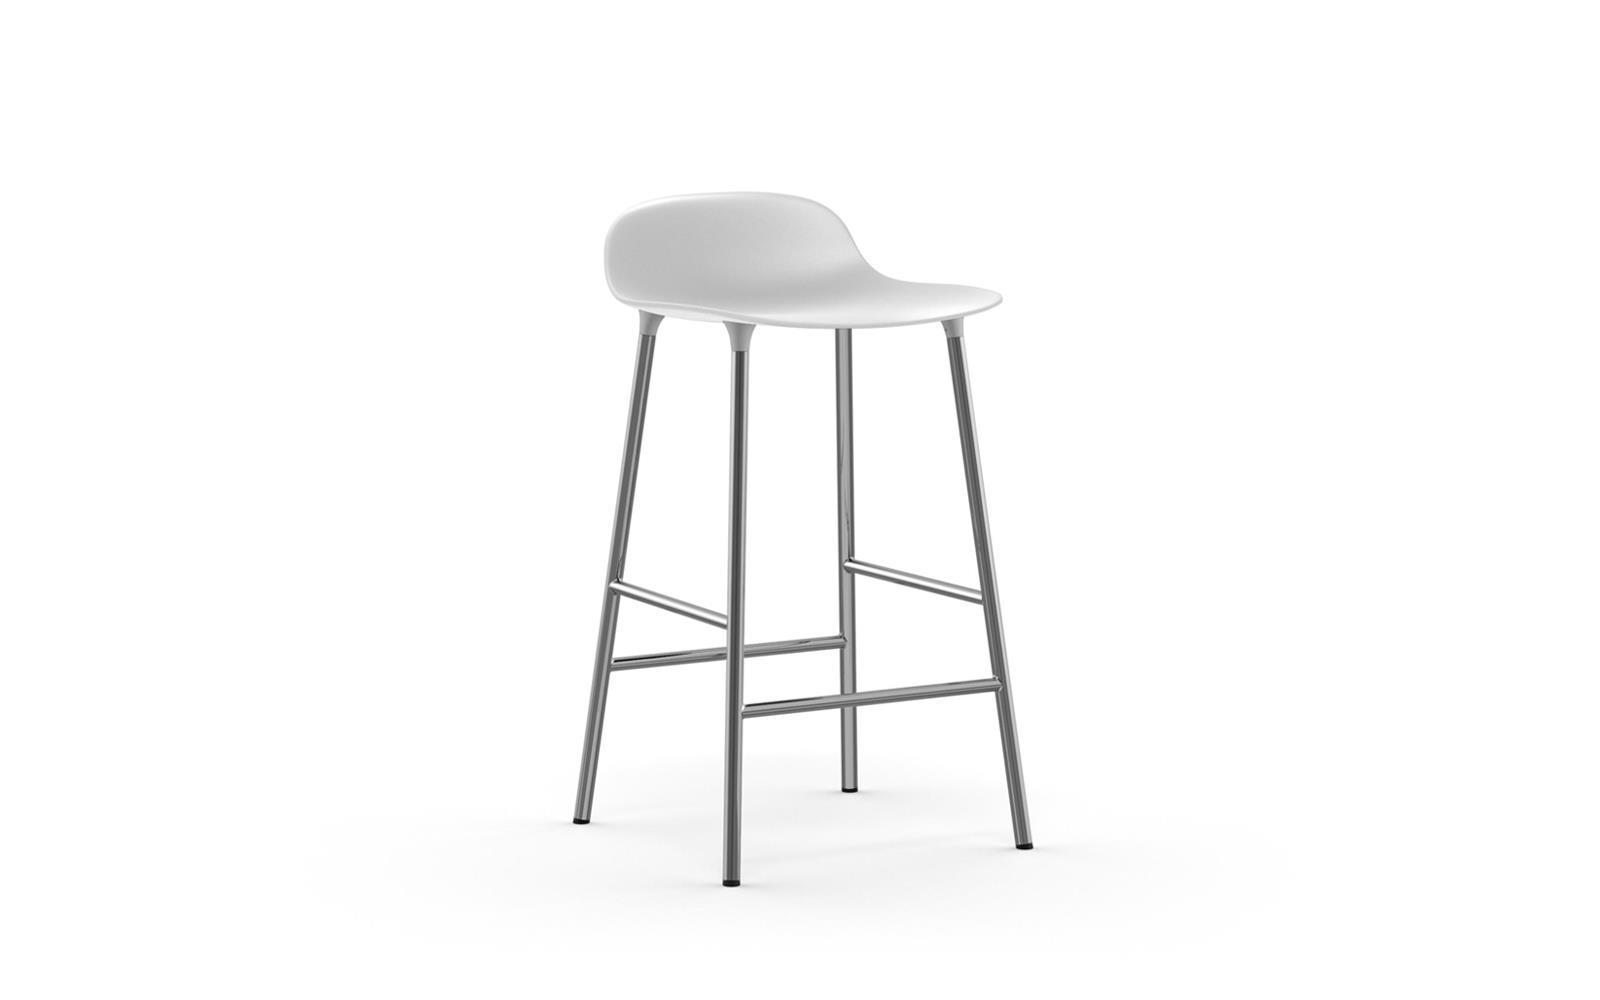 439b0f73d Form barstol 65 cm hvid/krom